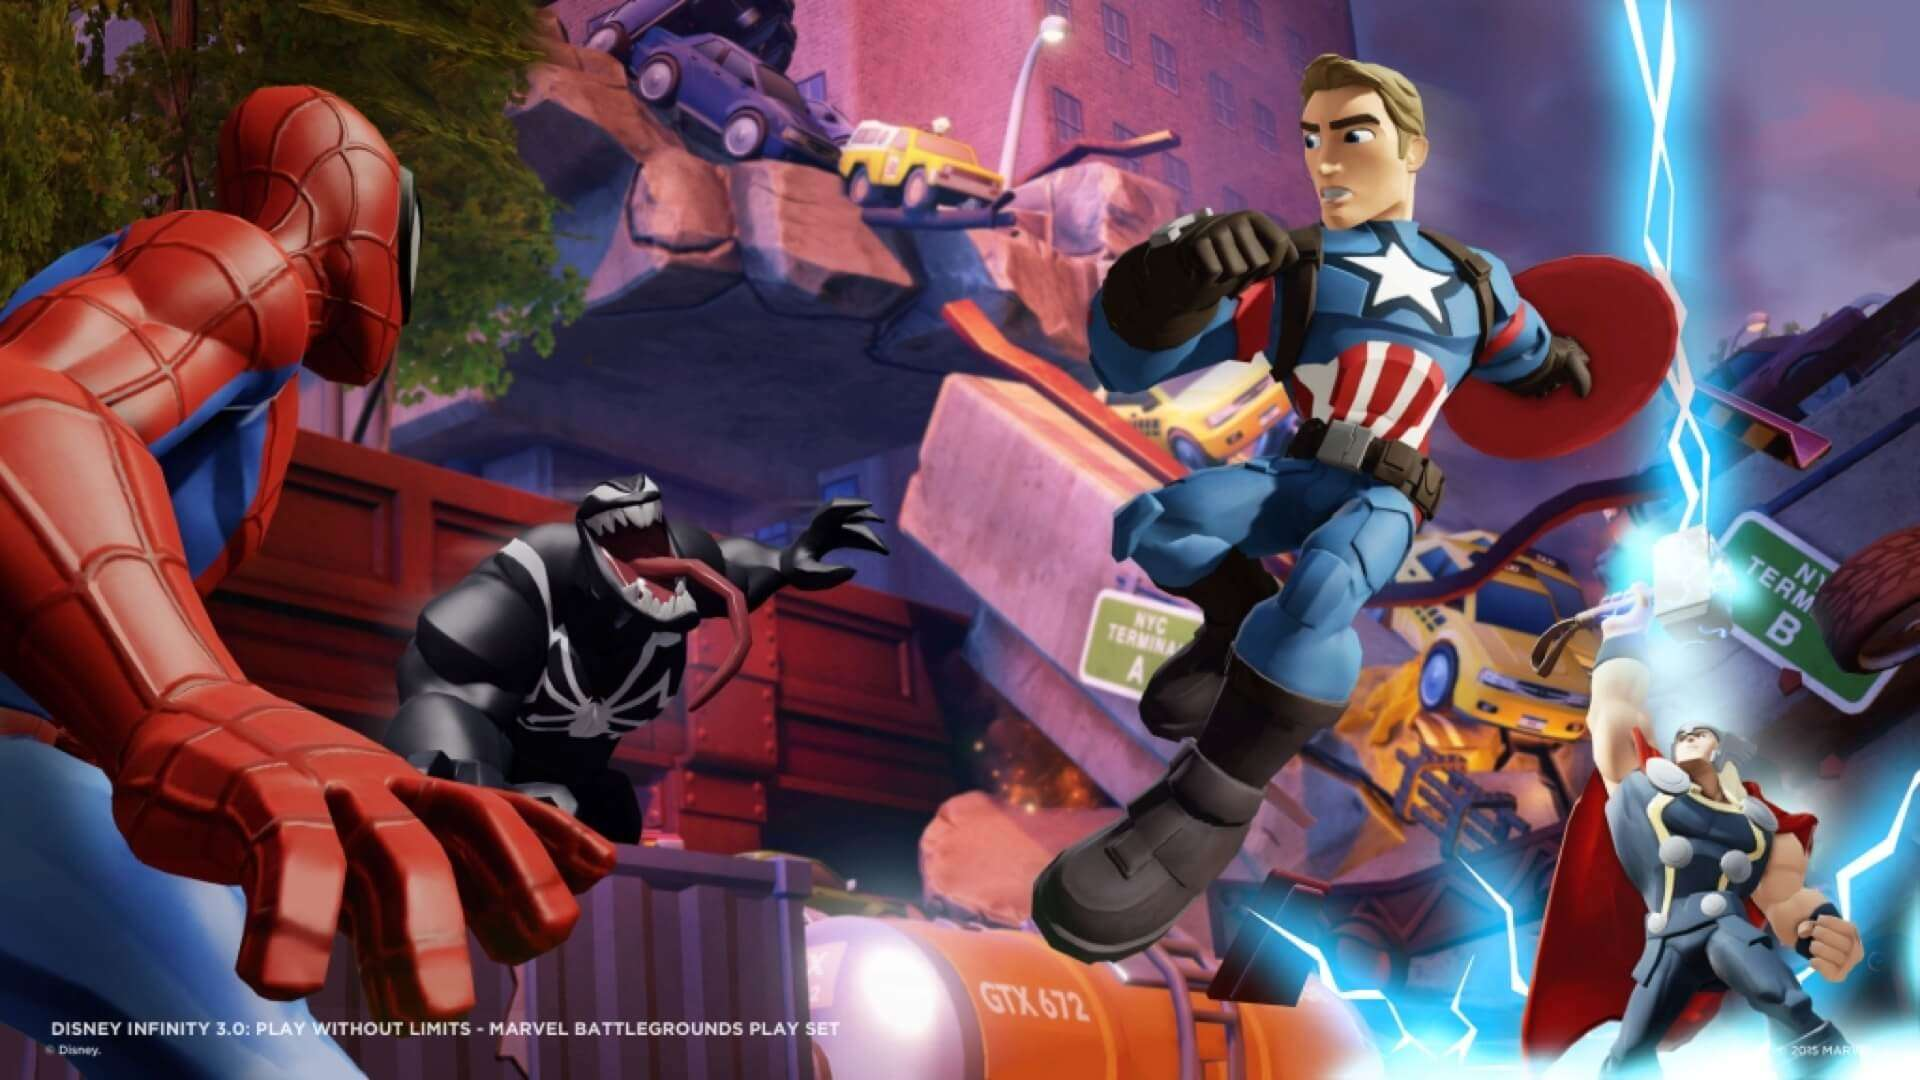 Marvel Battlegrounds: botte da orbi su Disney Infinity 3.0 18